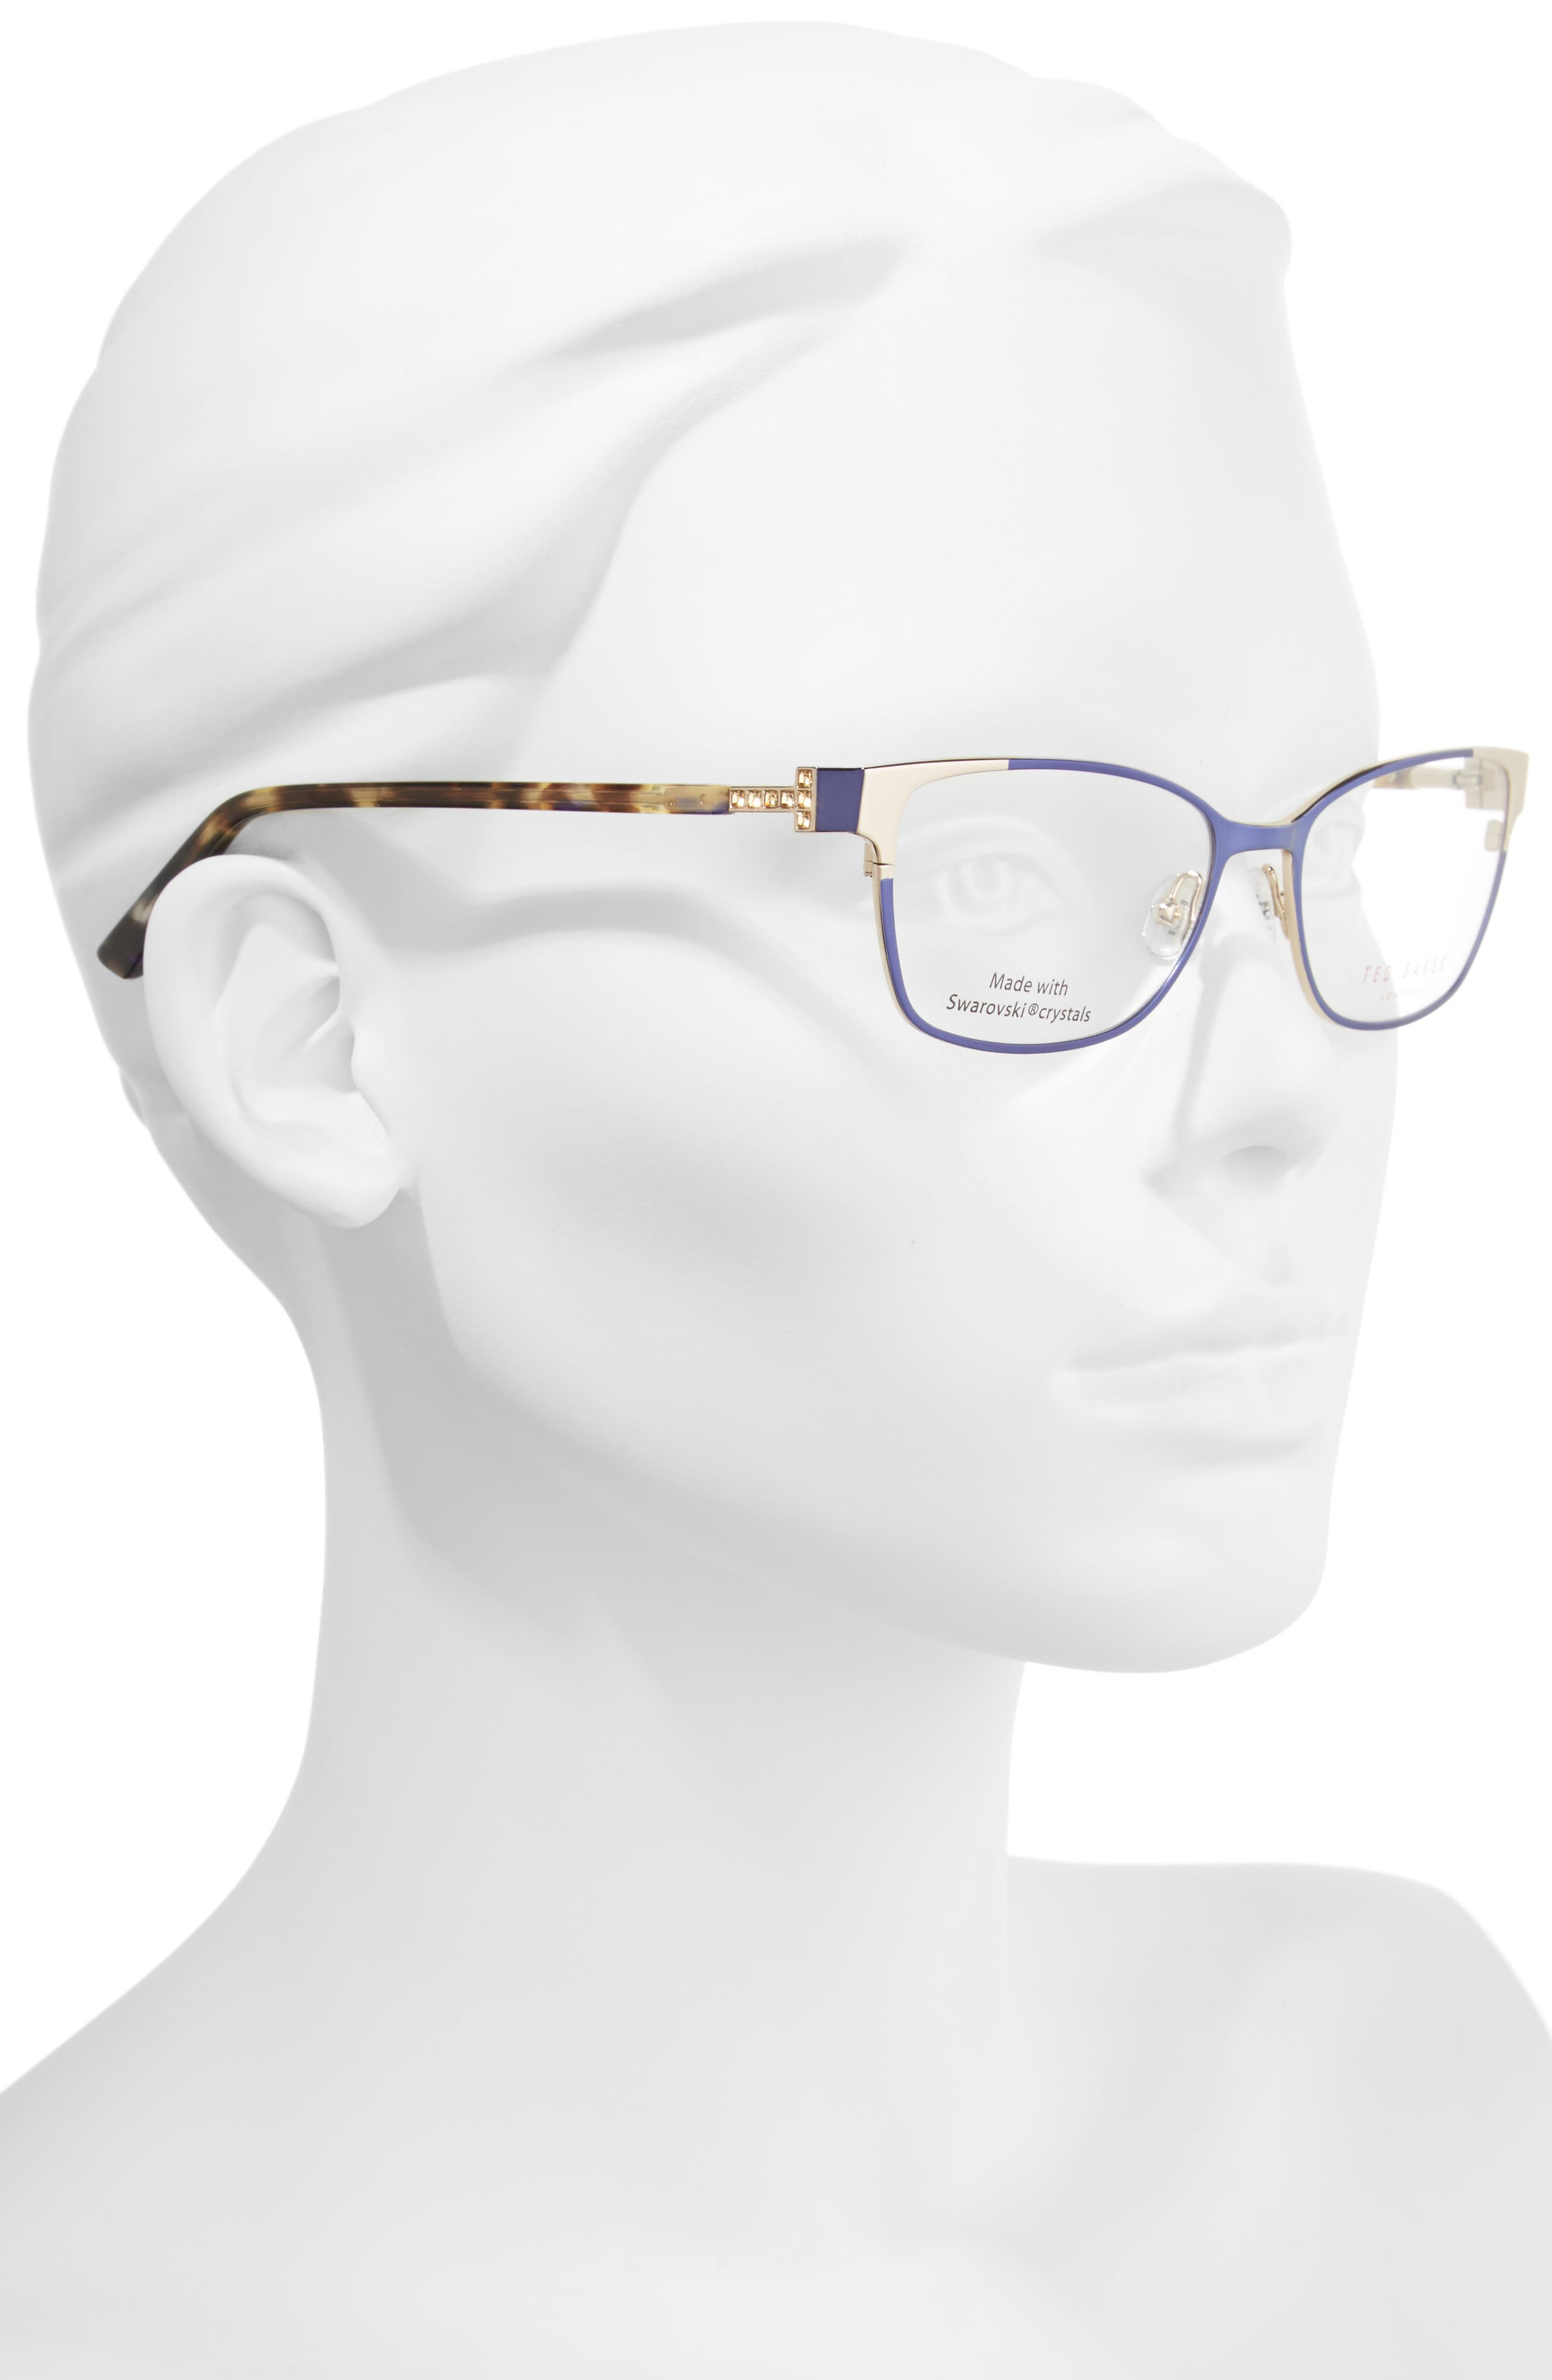 52mm Crystal Rectangular Optical Glasses,                             Alternate thumbnail 2, color,                             Blue